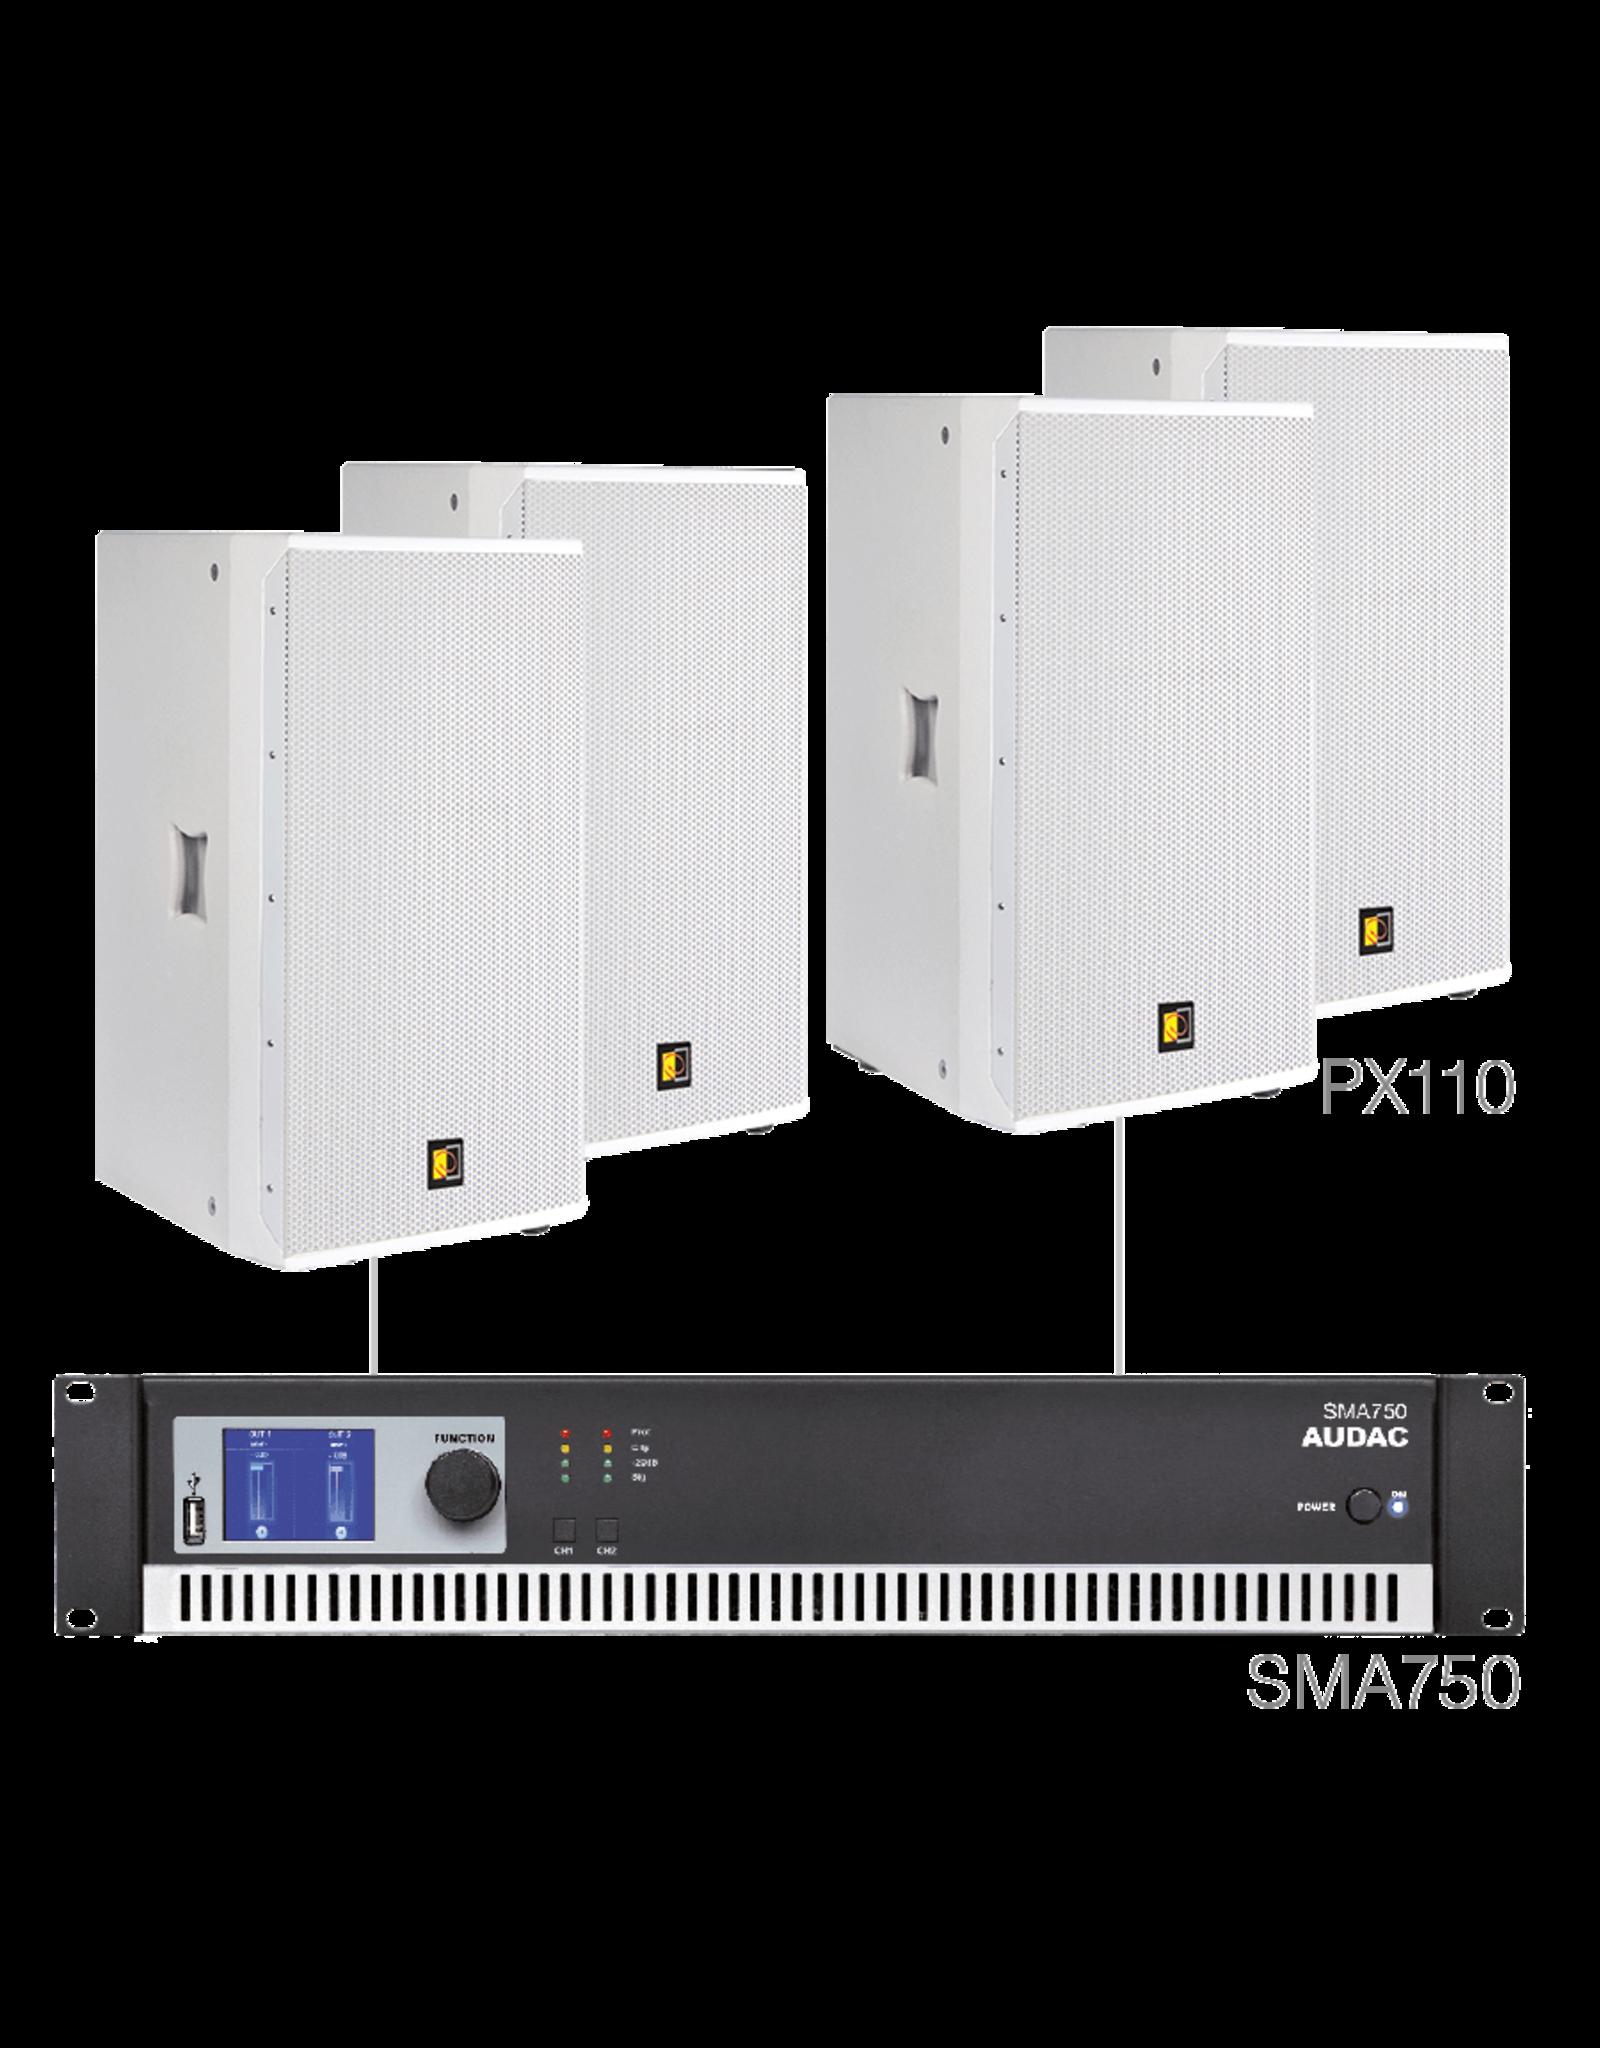 Audac 4 x PX110 + SMA750 White version